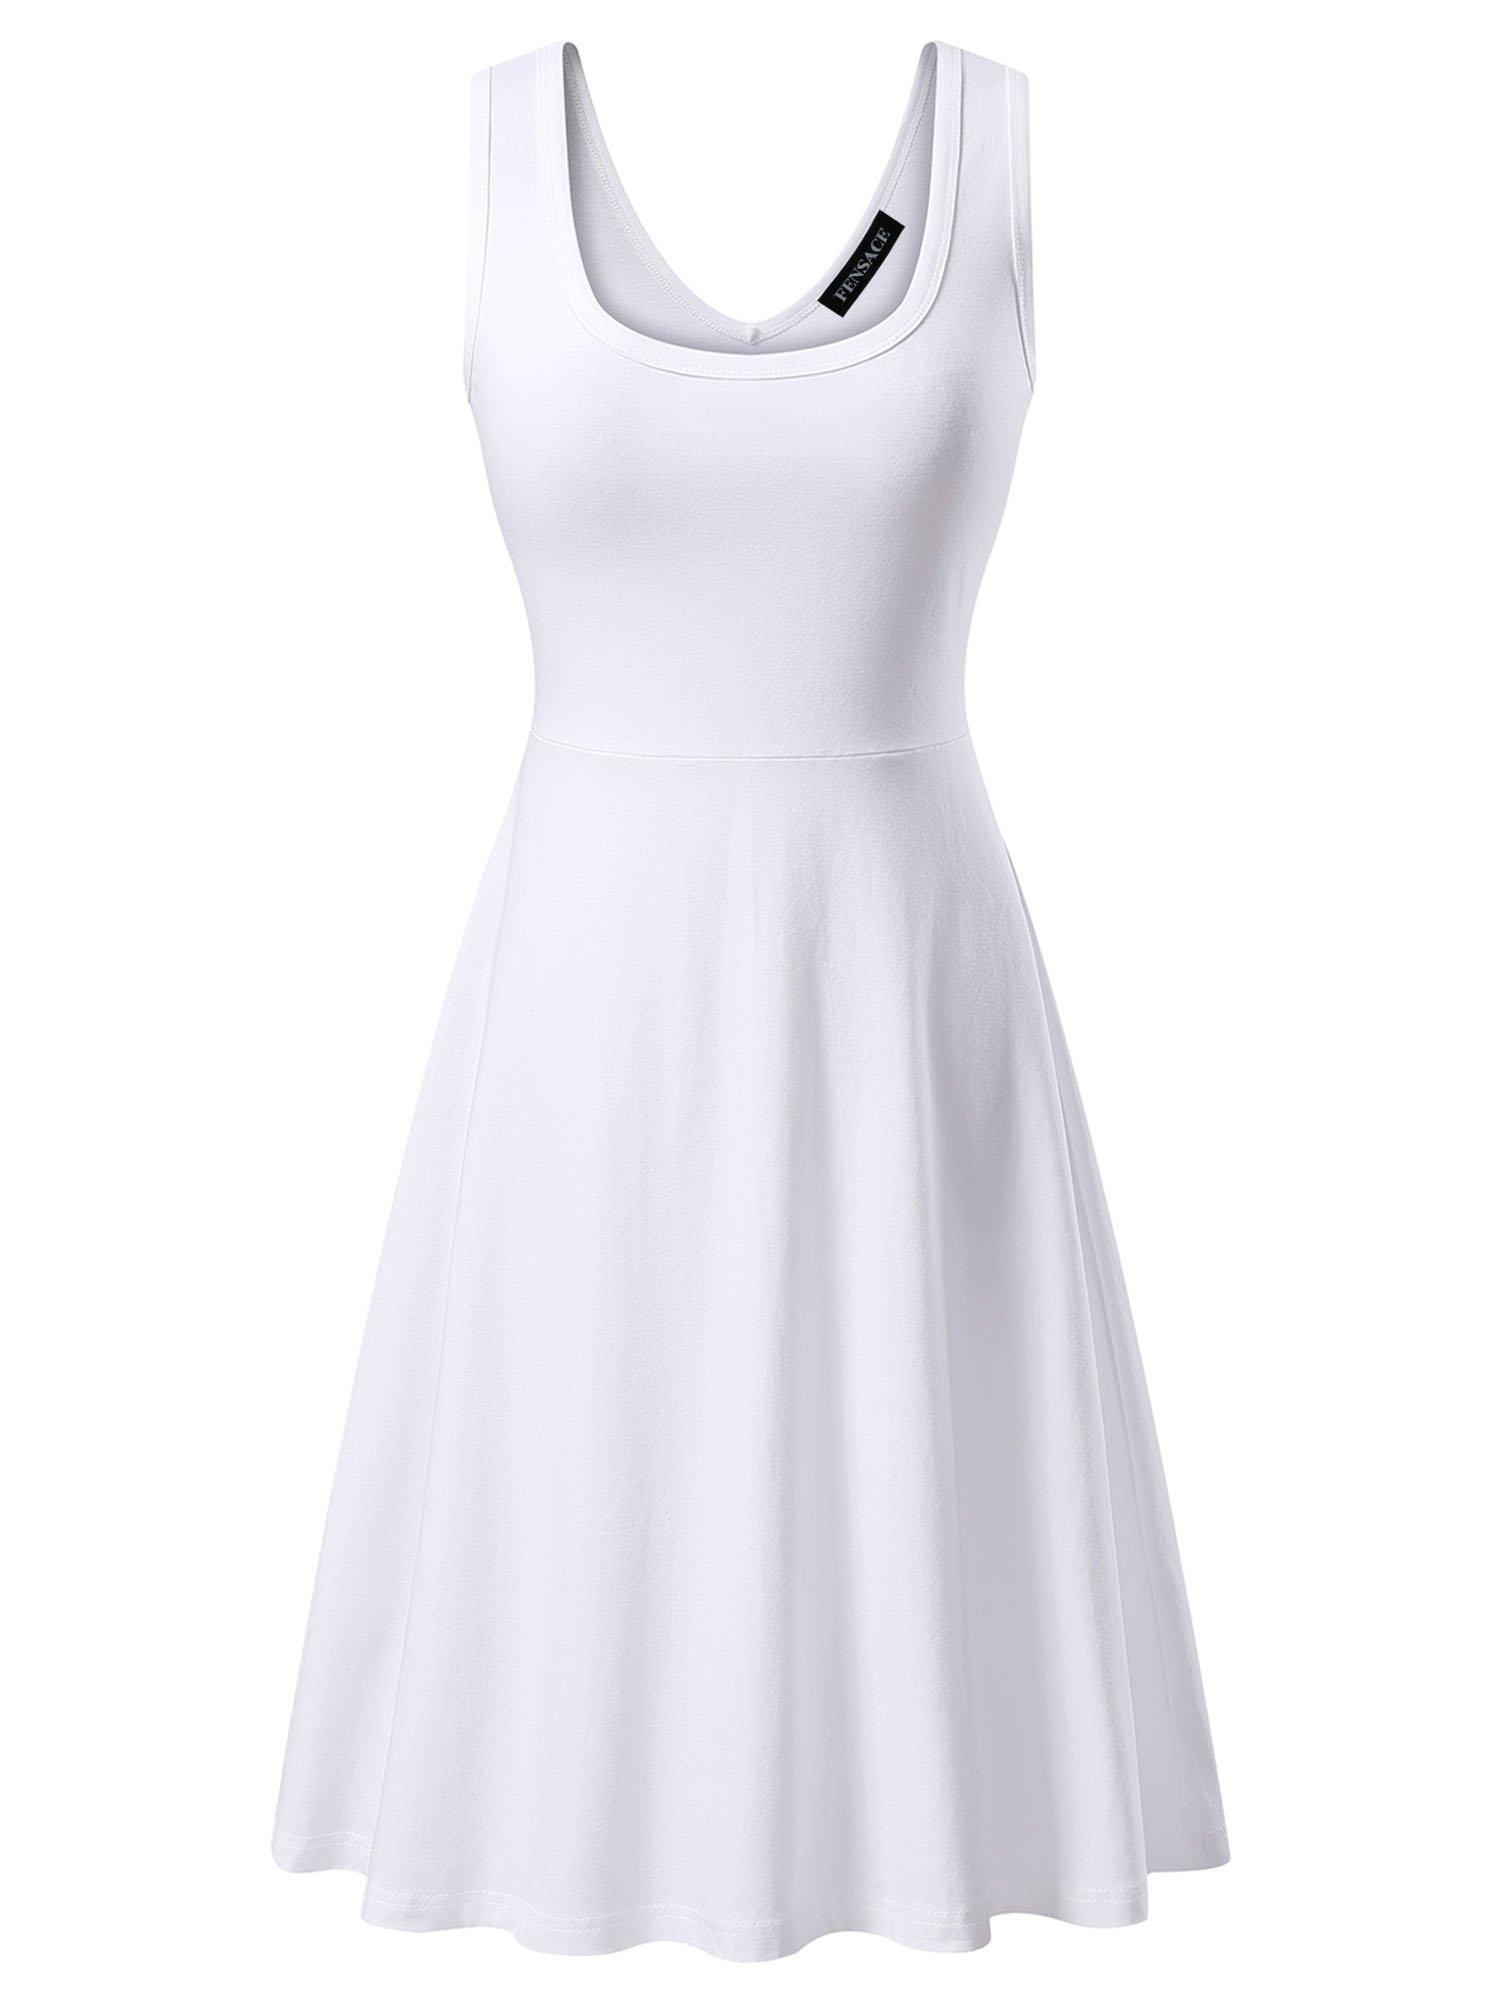 FENSACE Womens Sleeveless Scoop Neck Summer Beach Midi A Line Tank Dress, White, Medium